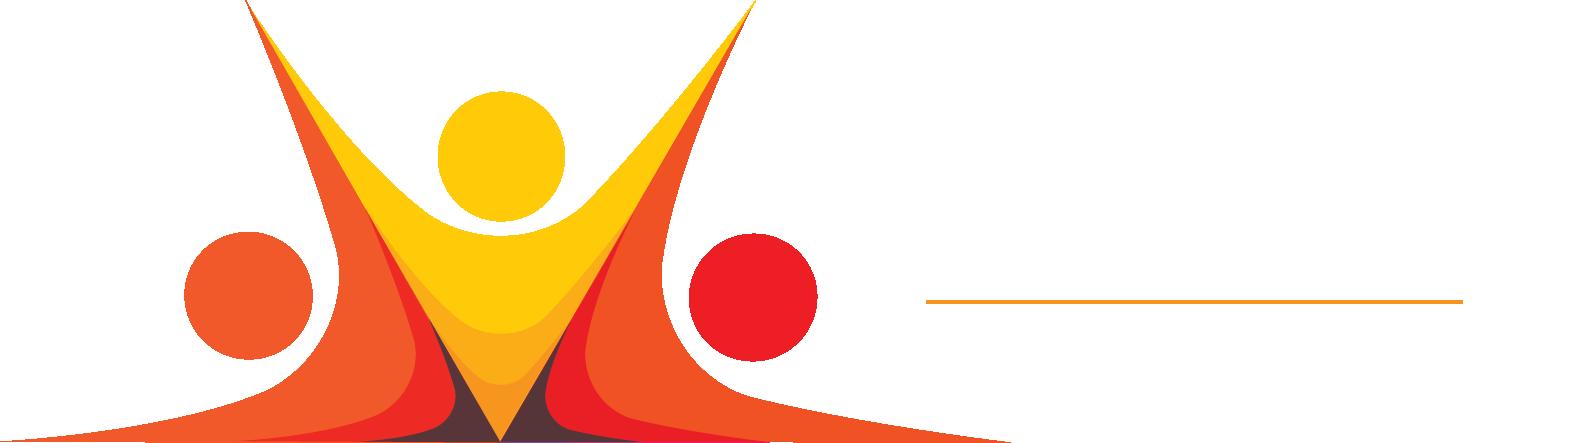 Grab Smm